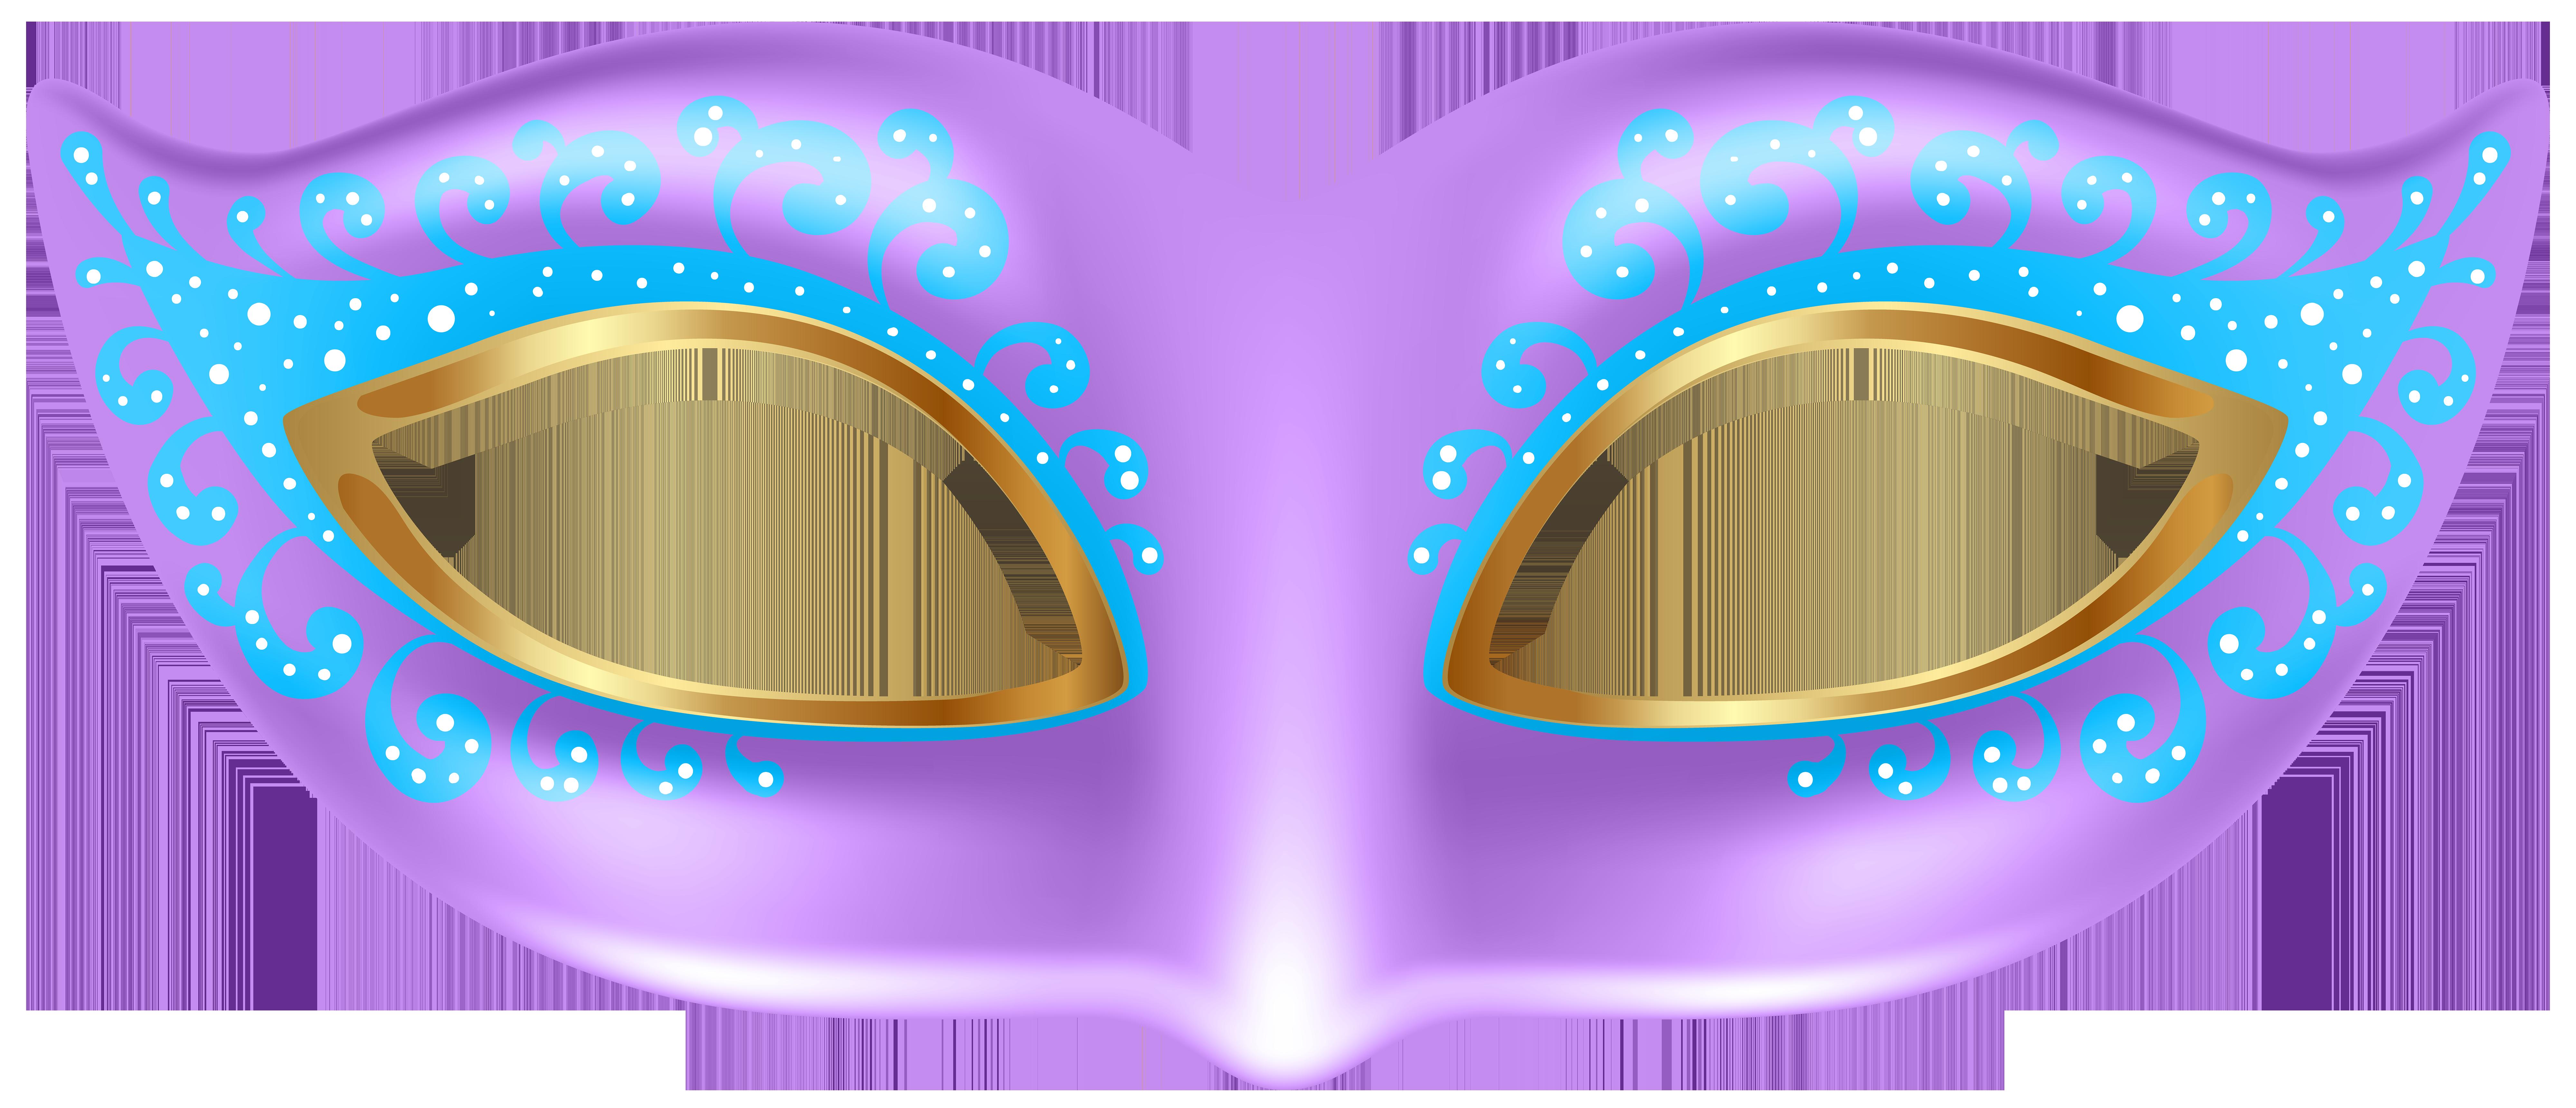 Carnival clipart eye mask Gallery Art Transparent full View